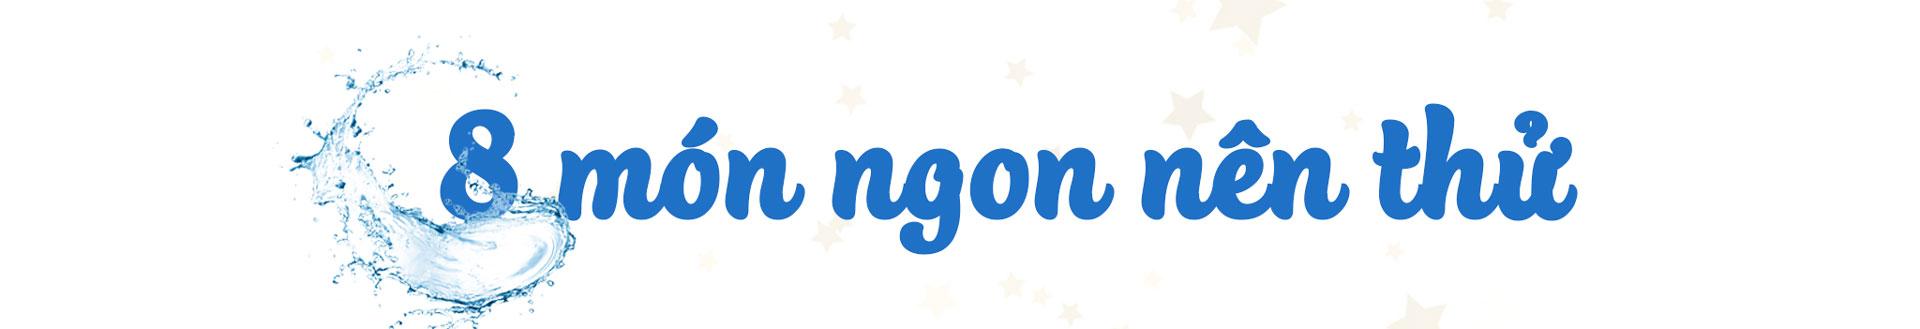 8 mon ngon nen thu 4319 1543548199 - Phu Quoc travel experience